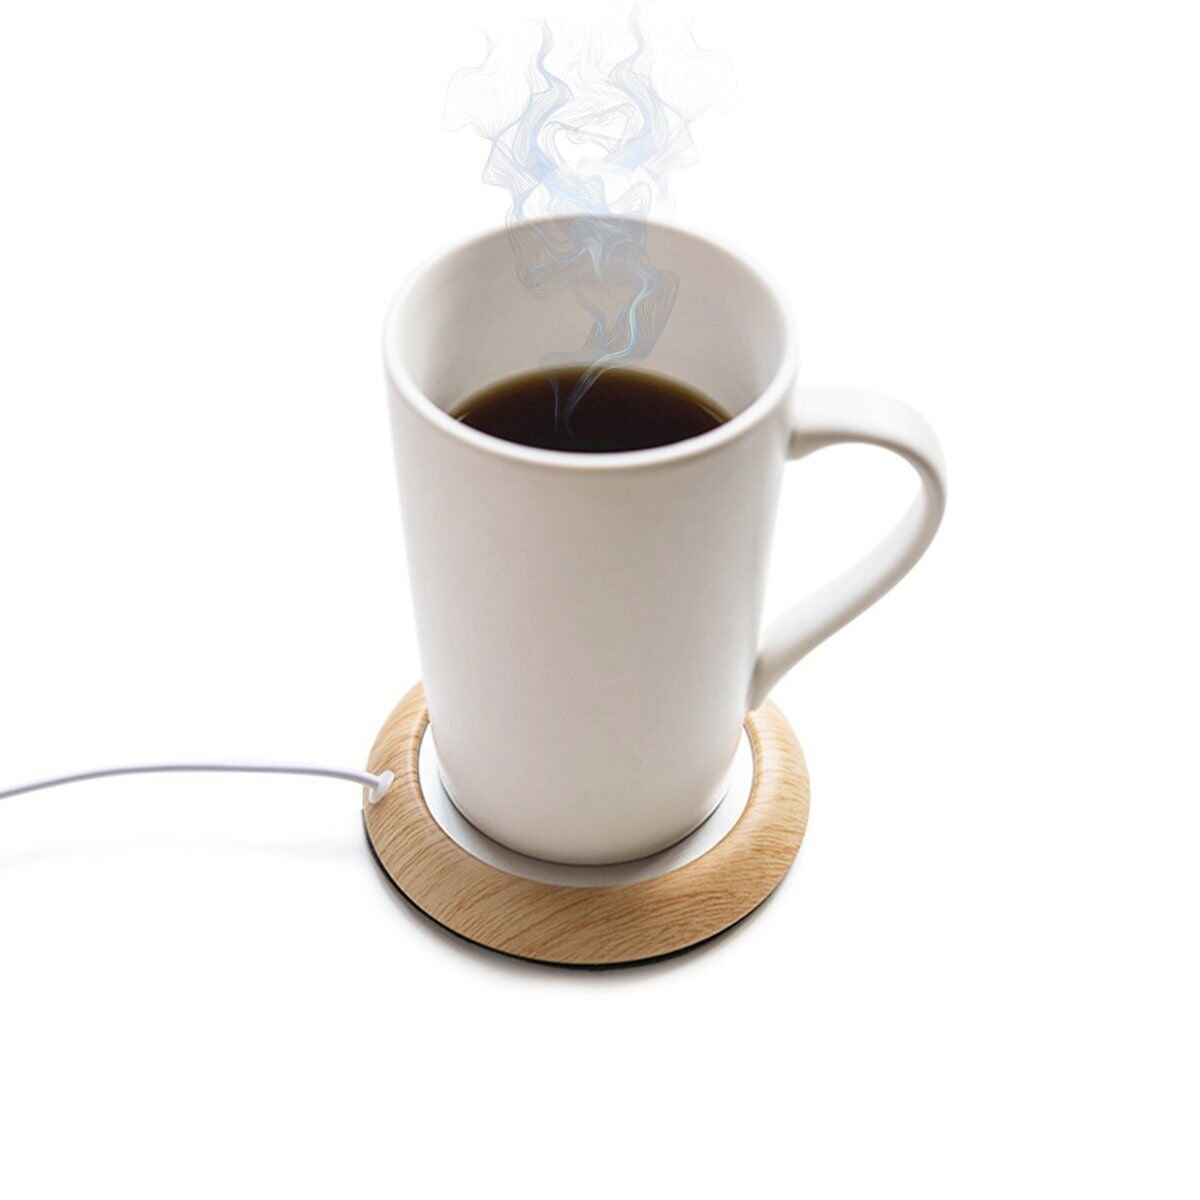 UniM Coffee Warmer USB Mug Warmer Beverage/Drink/Tea Warmer for Office/Home Use (Light Wood Grain)